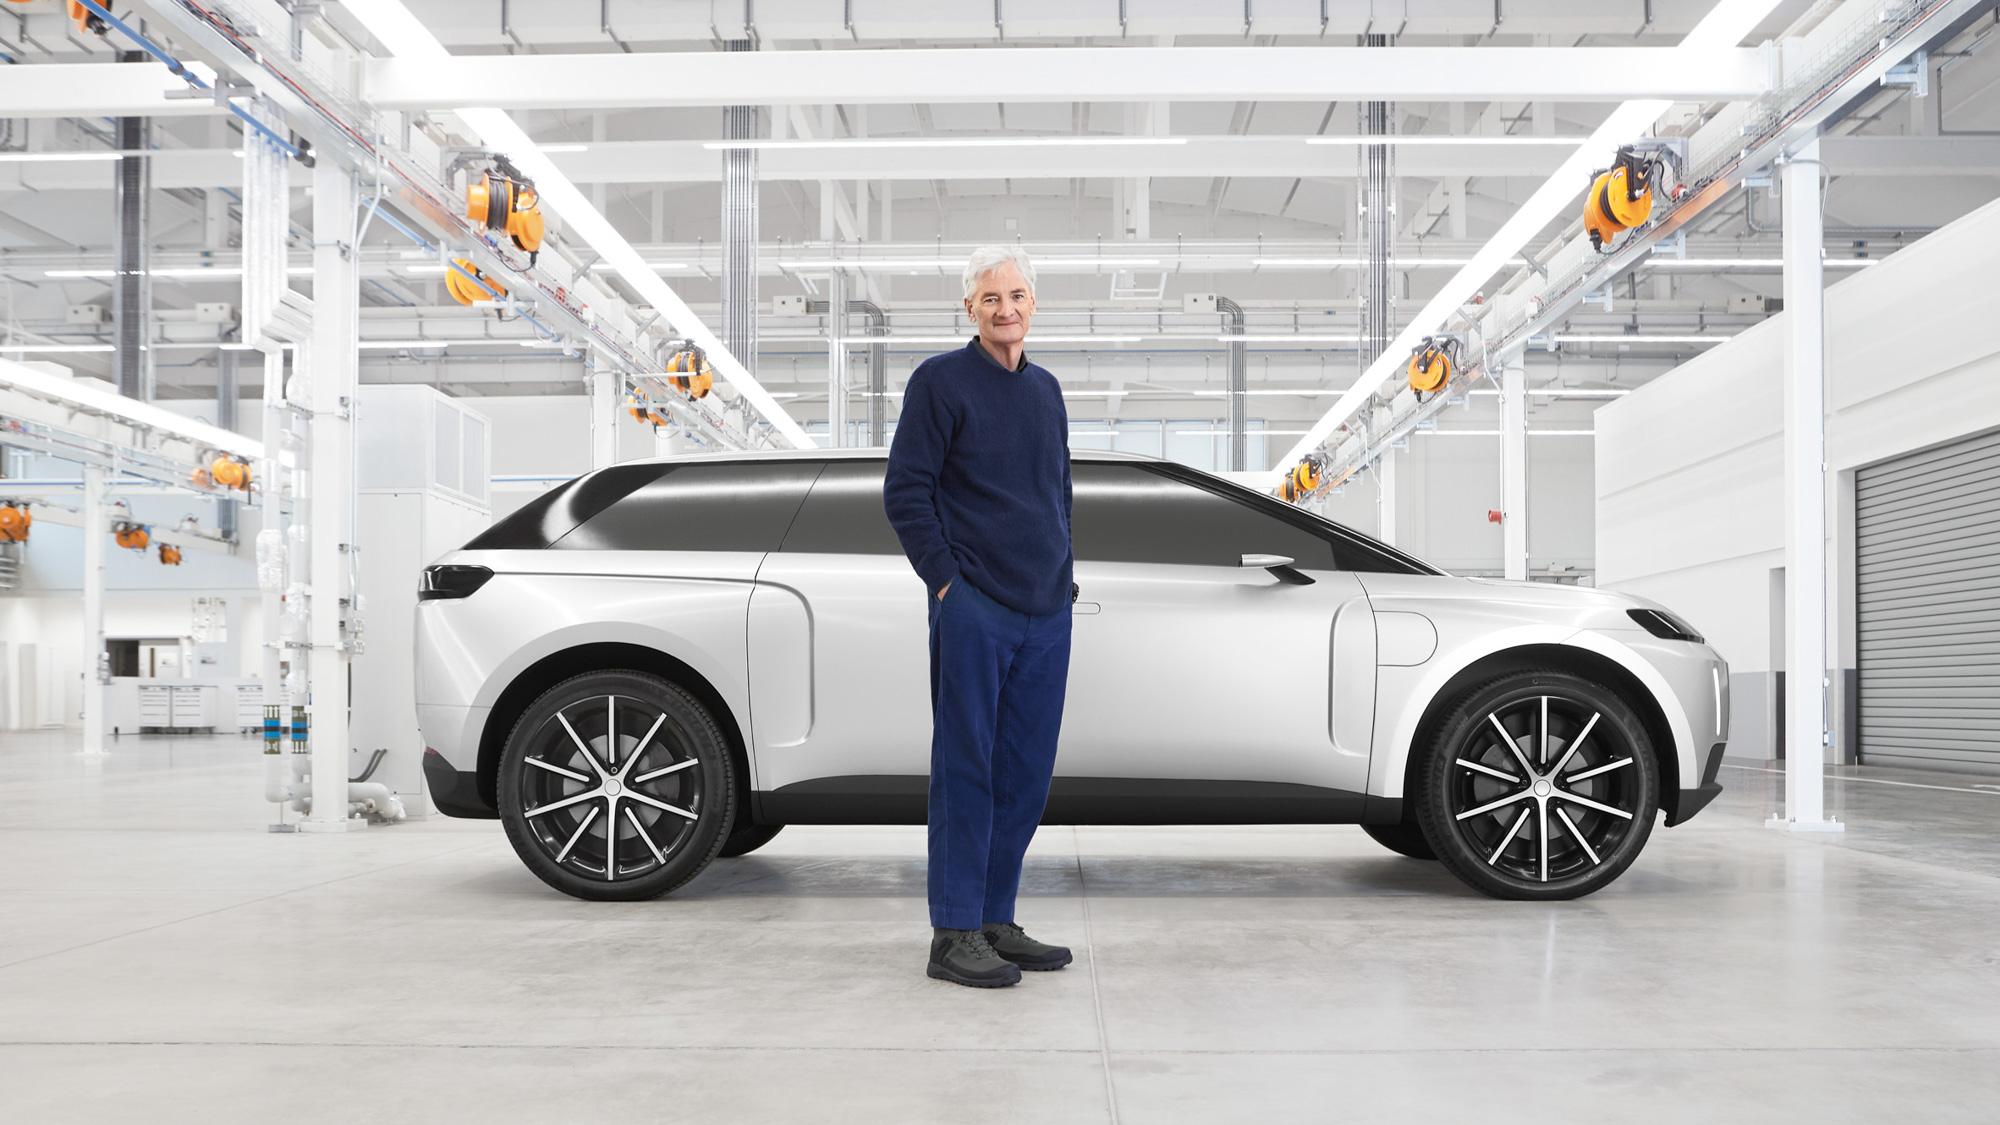 Джеймс Дайсон и прототип электромобиля Dyson